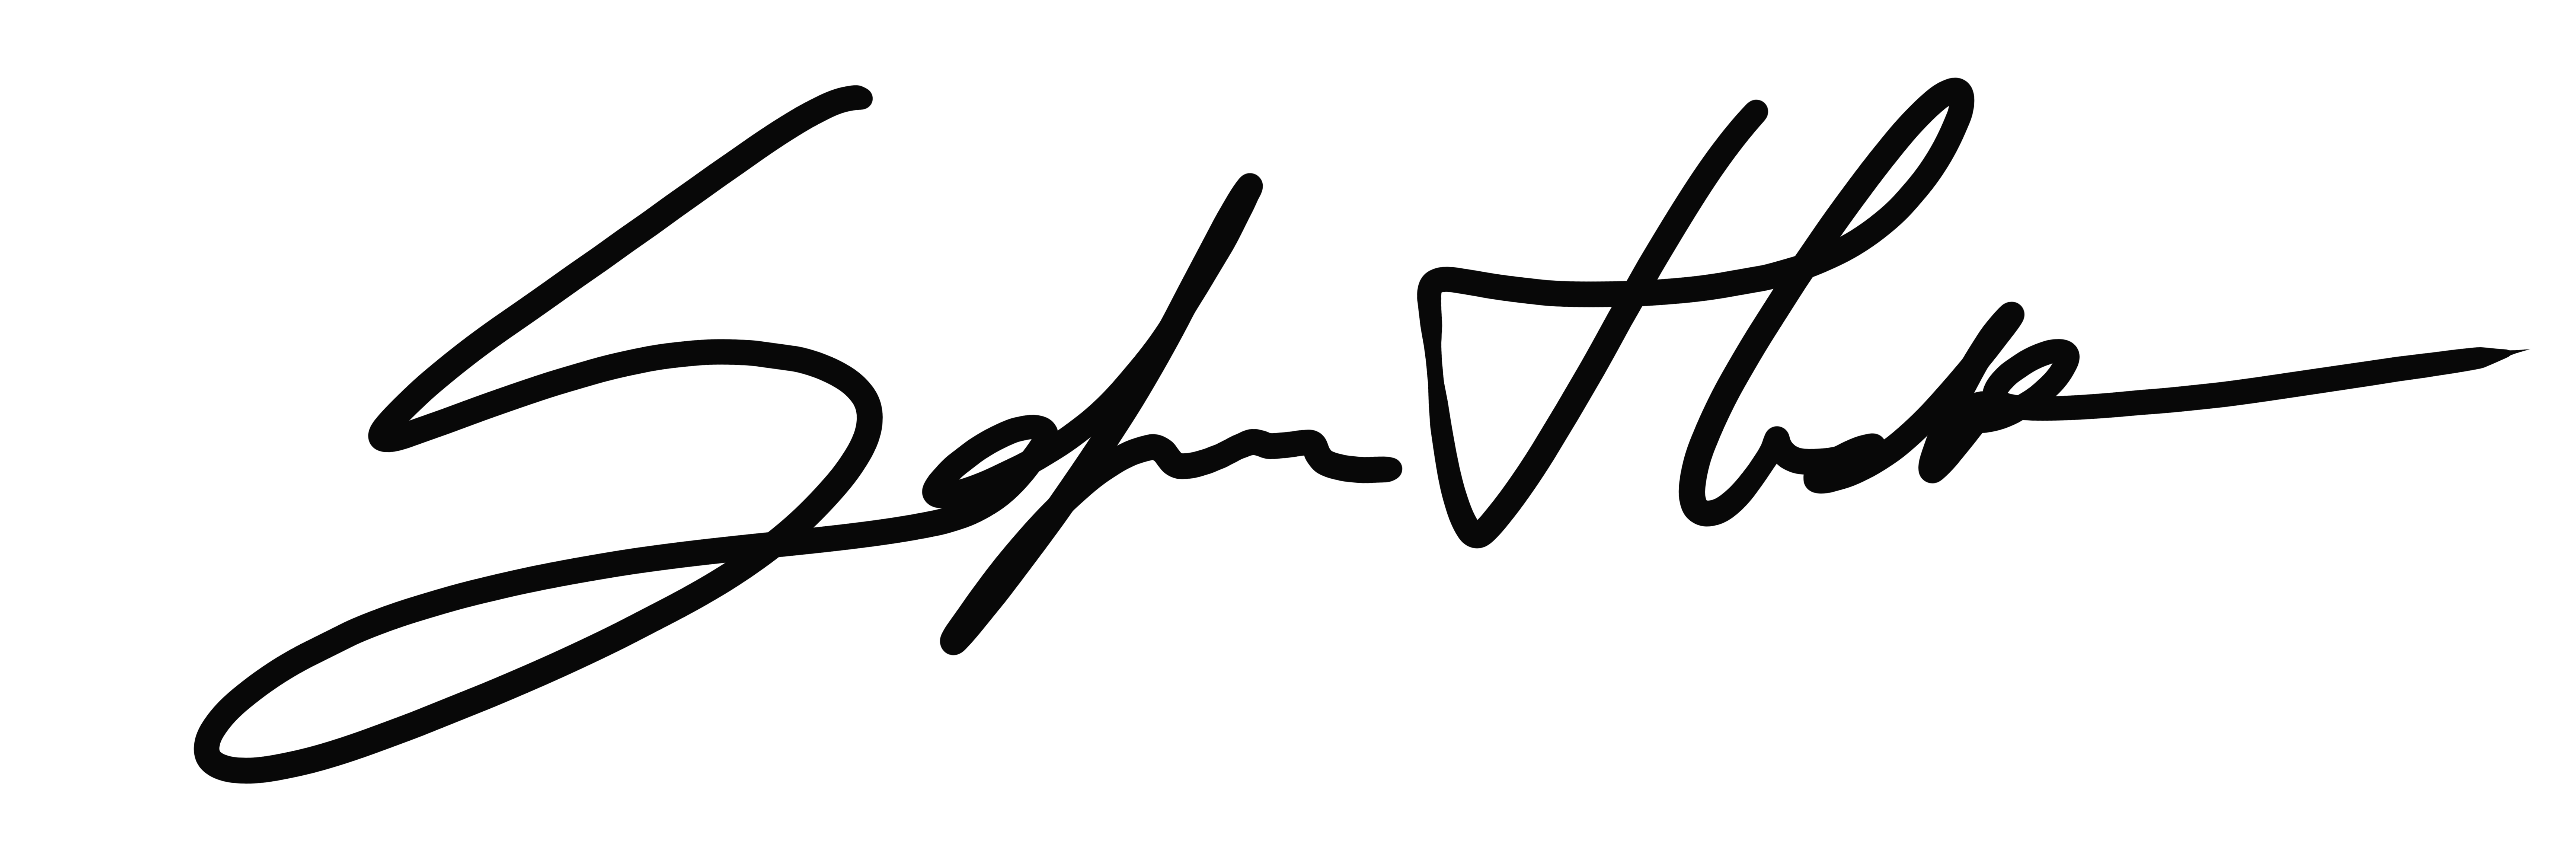 Firma 3 copia